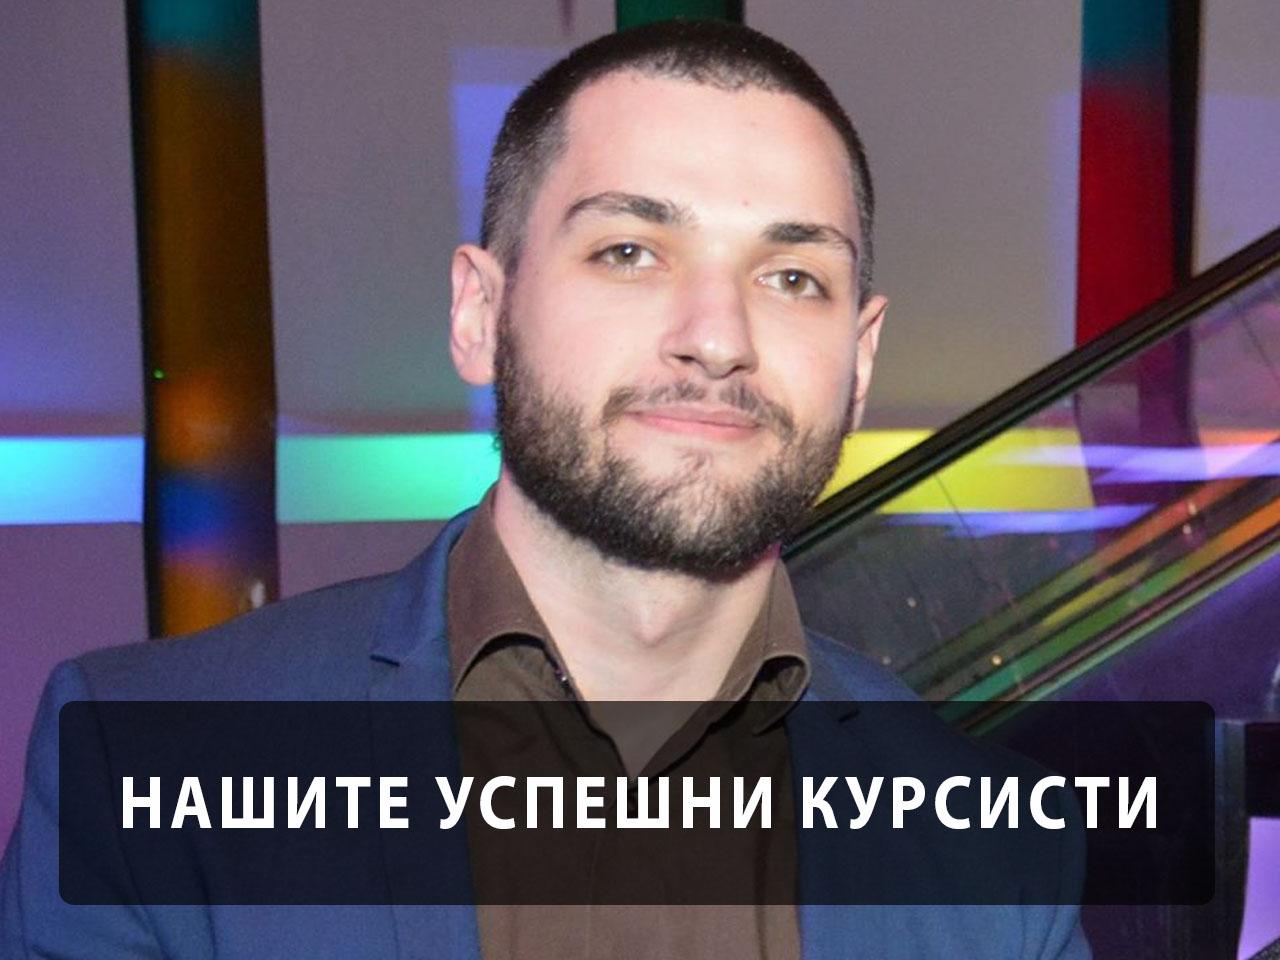 програмиране-java-maksim dilovski